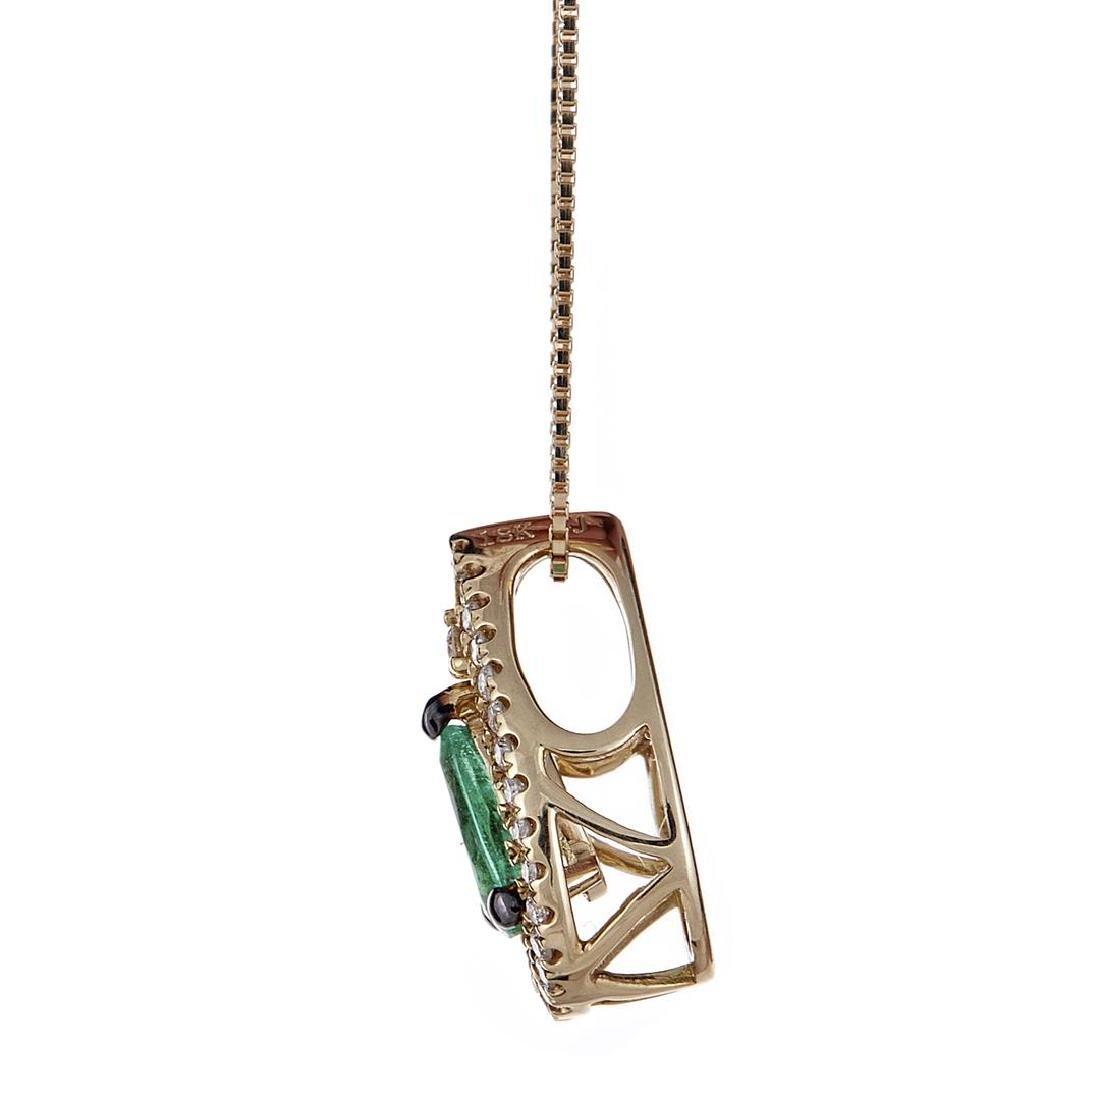 0.34 ctw Emerald and Diamond Pendant - 18KT Yellow Gold - 2